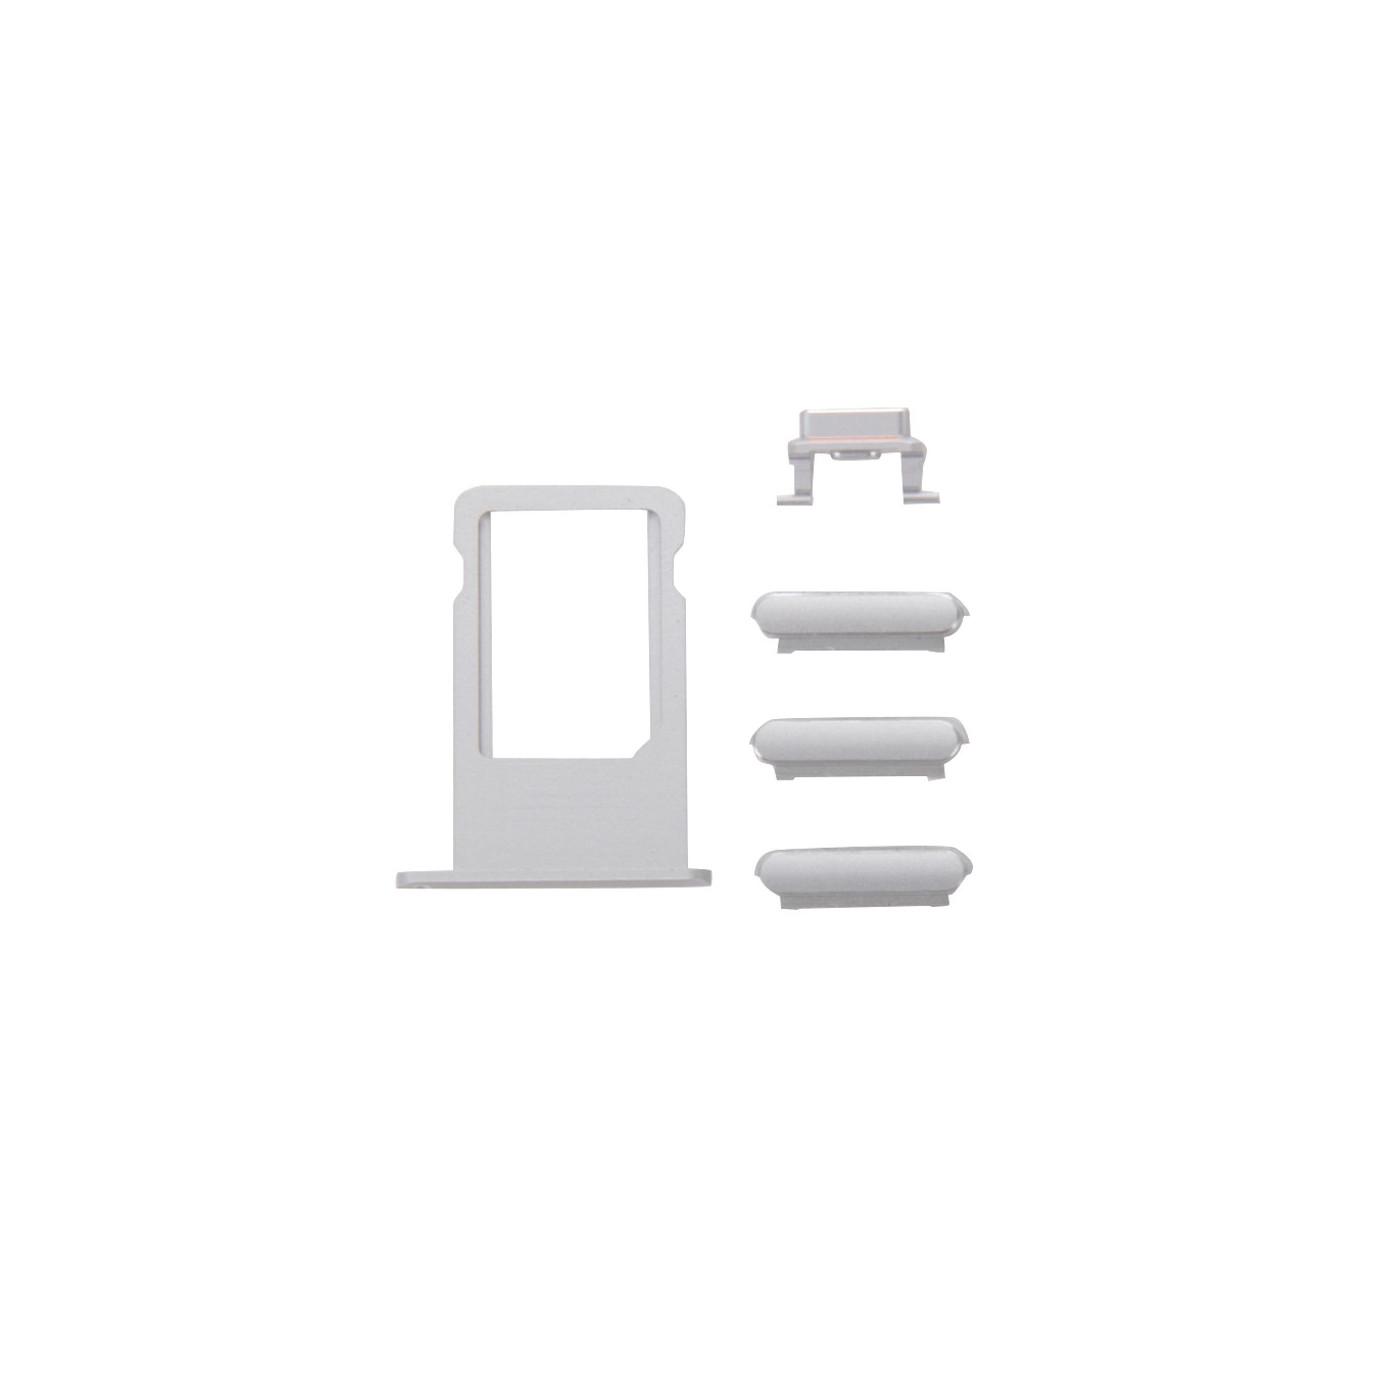 Kit keys 3 en 1 volumen de energía iPhone 6s plateado + titular de tarjeta sim